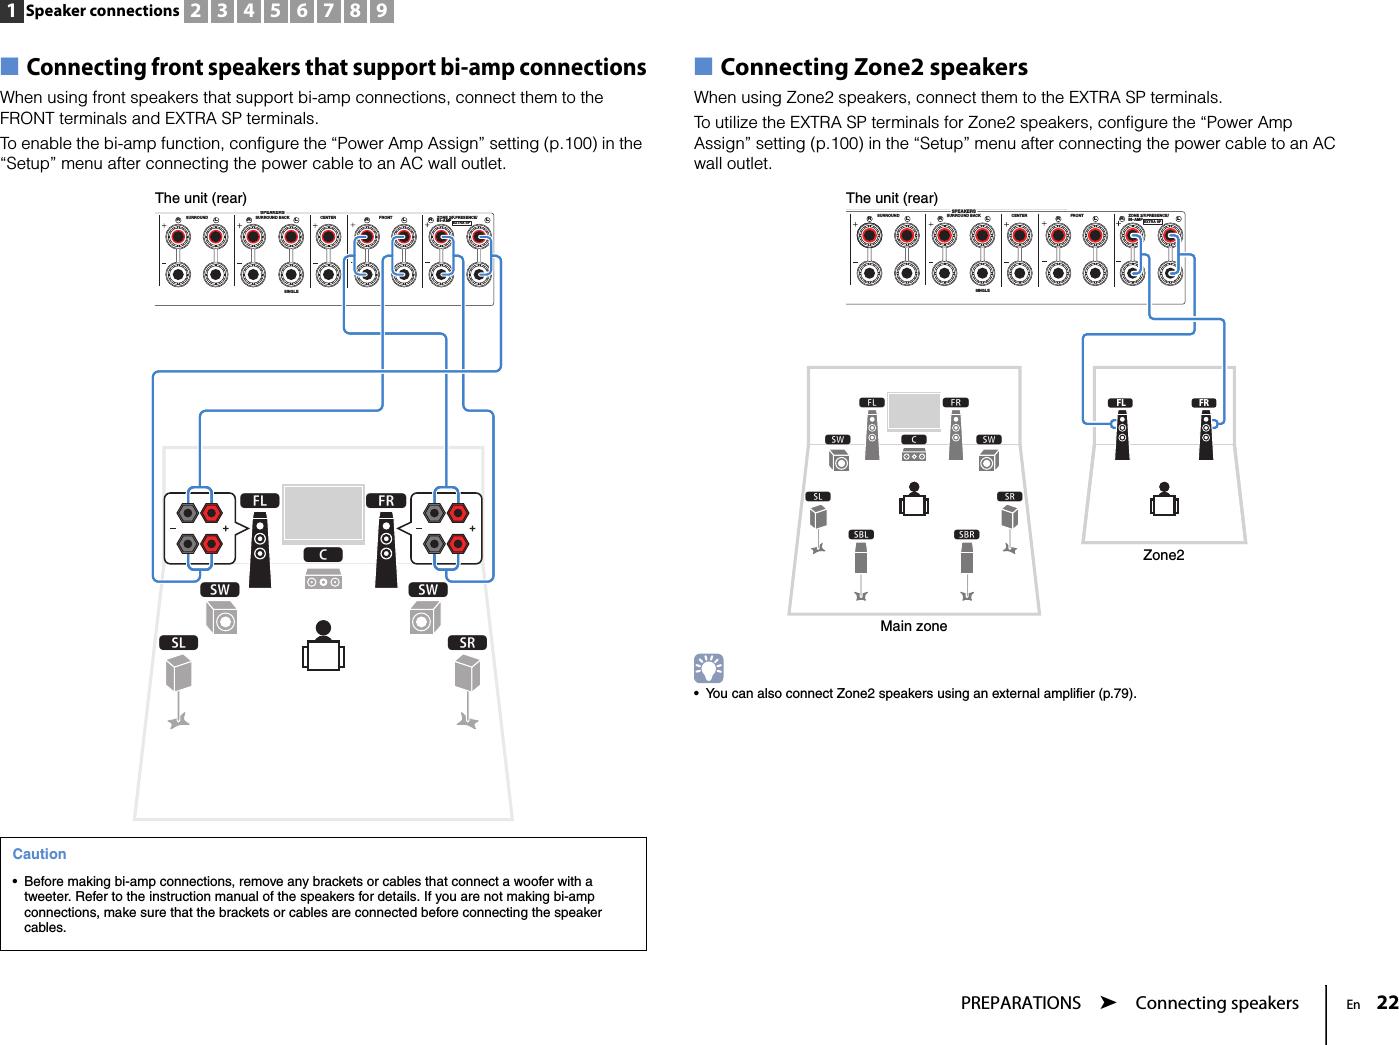 yamaha rx a1020 manualPatriot Cvt Transmission Diagram Furthermore Hdmi Cable Pinout Diagram #19